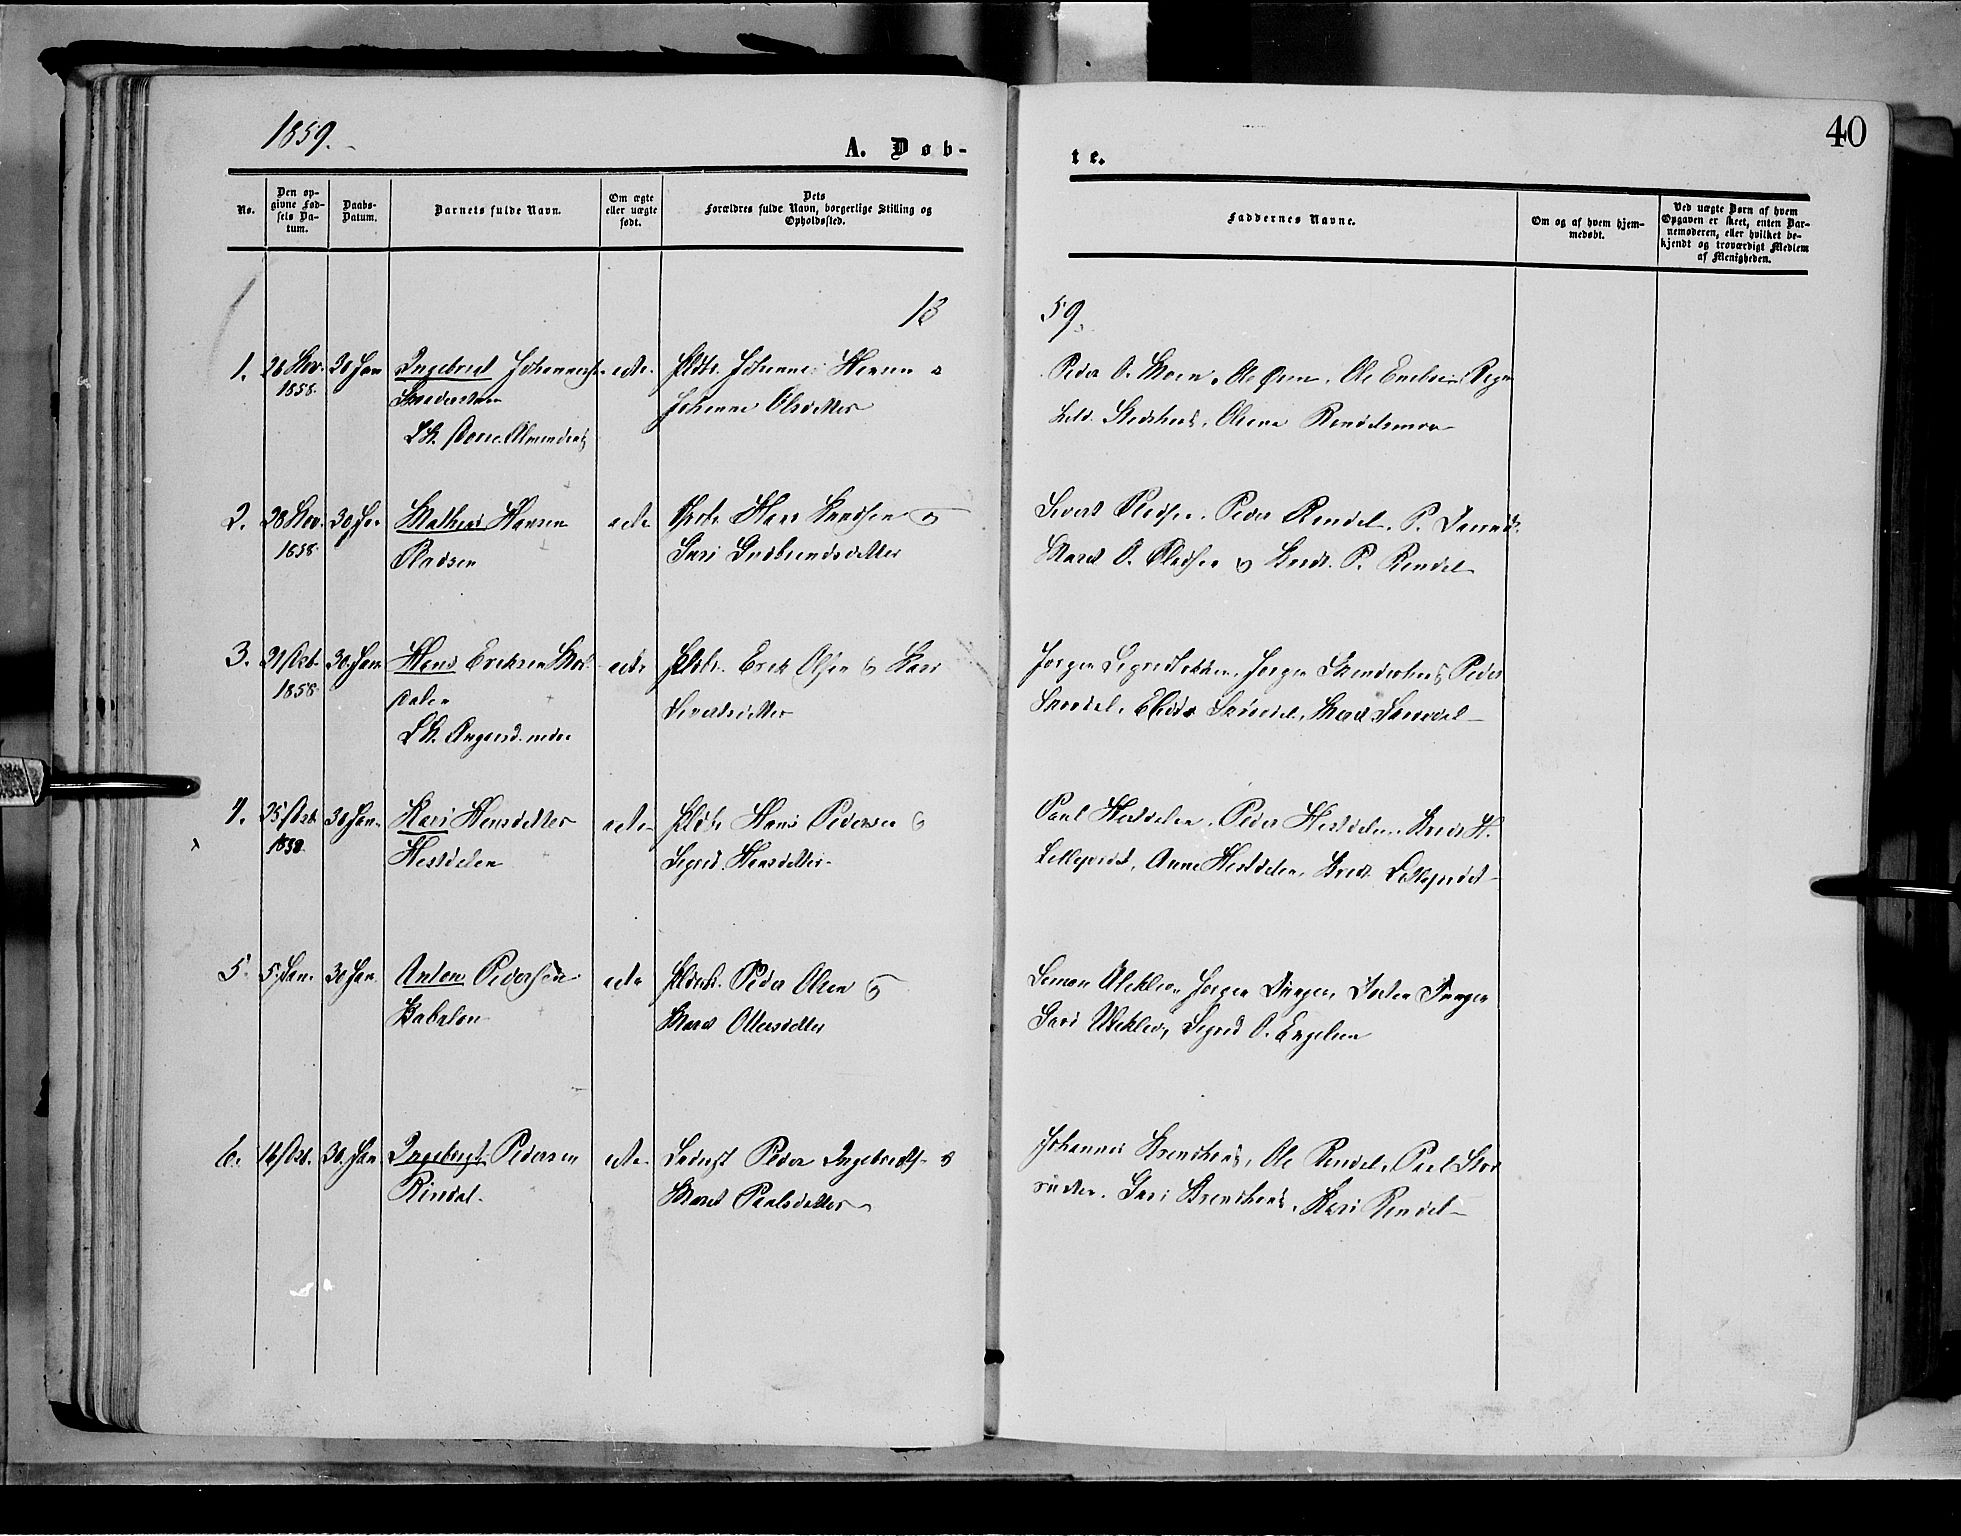 SAH, Dovre prestekontor, Parish register (official) no. 1, 1854-1878, p. 40